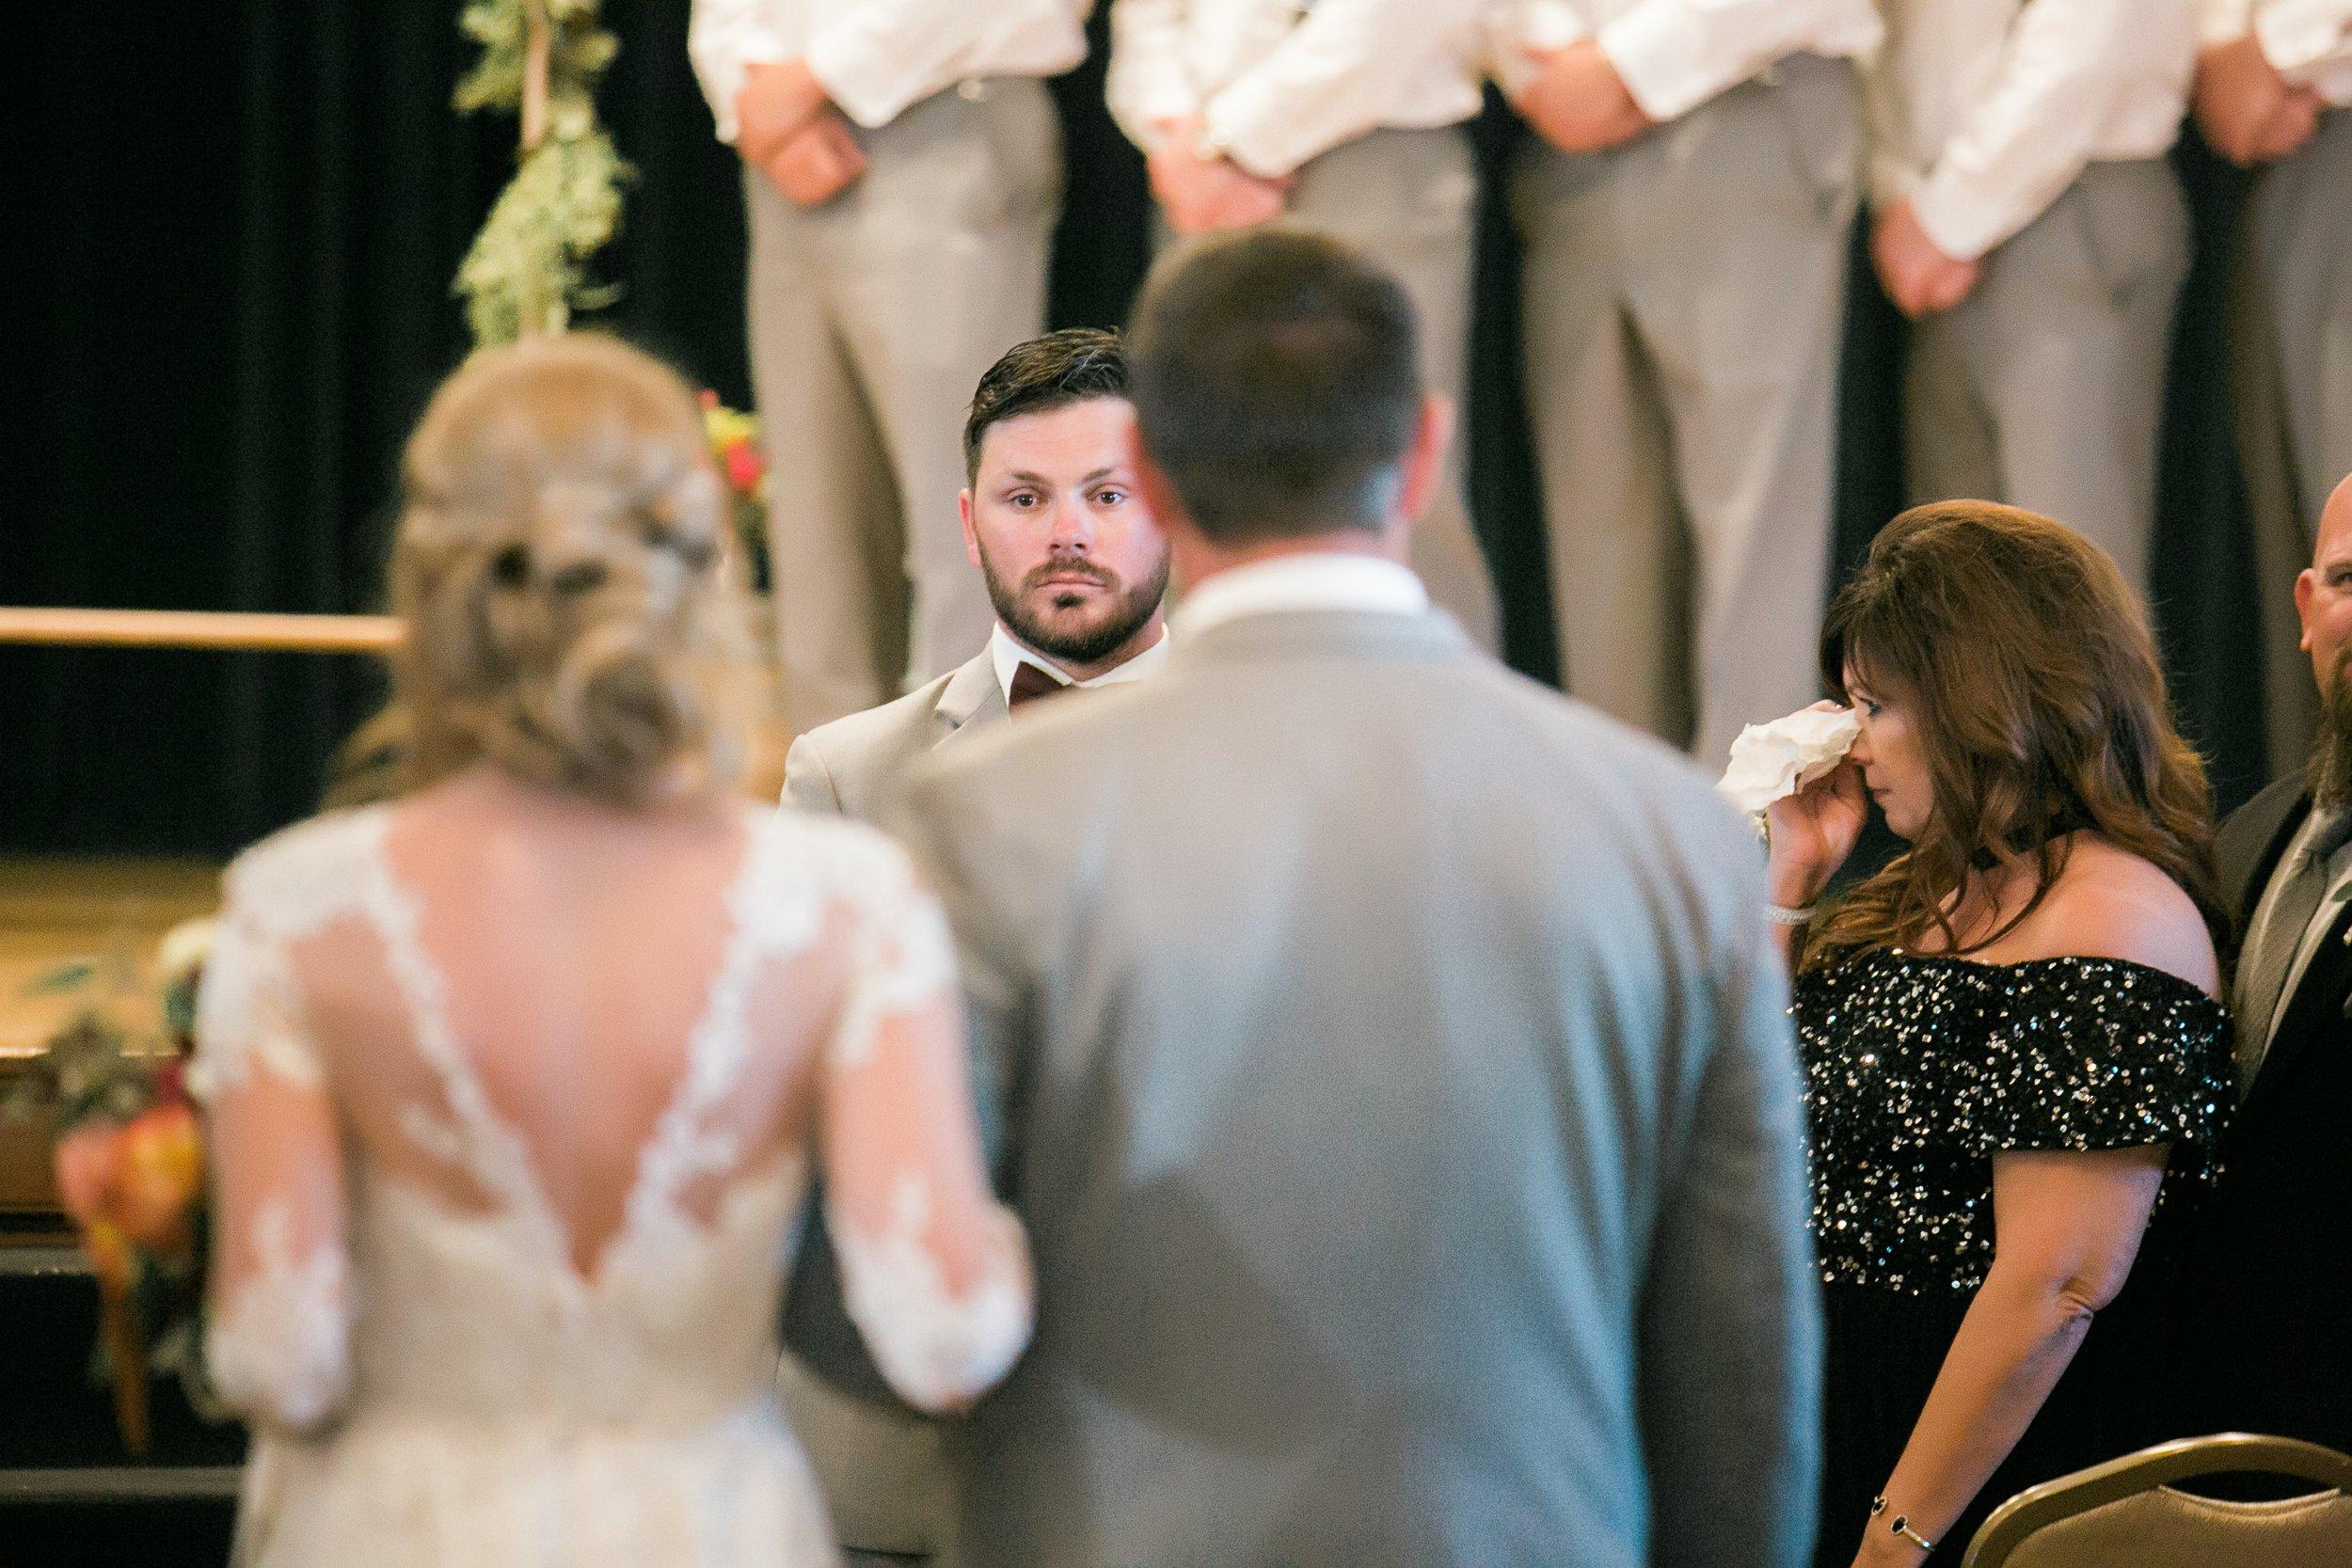 Roberson-Wedding-The-Forum-Lauren-Pinson-Wedding-Photography-Wichita-Falls-Texas-072.jpg